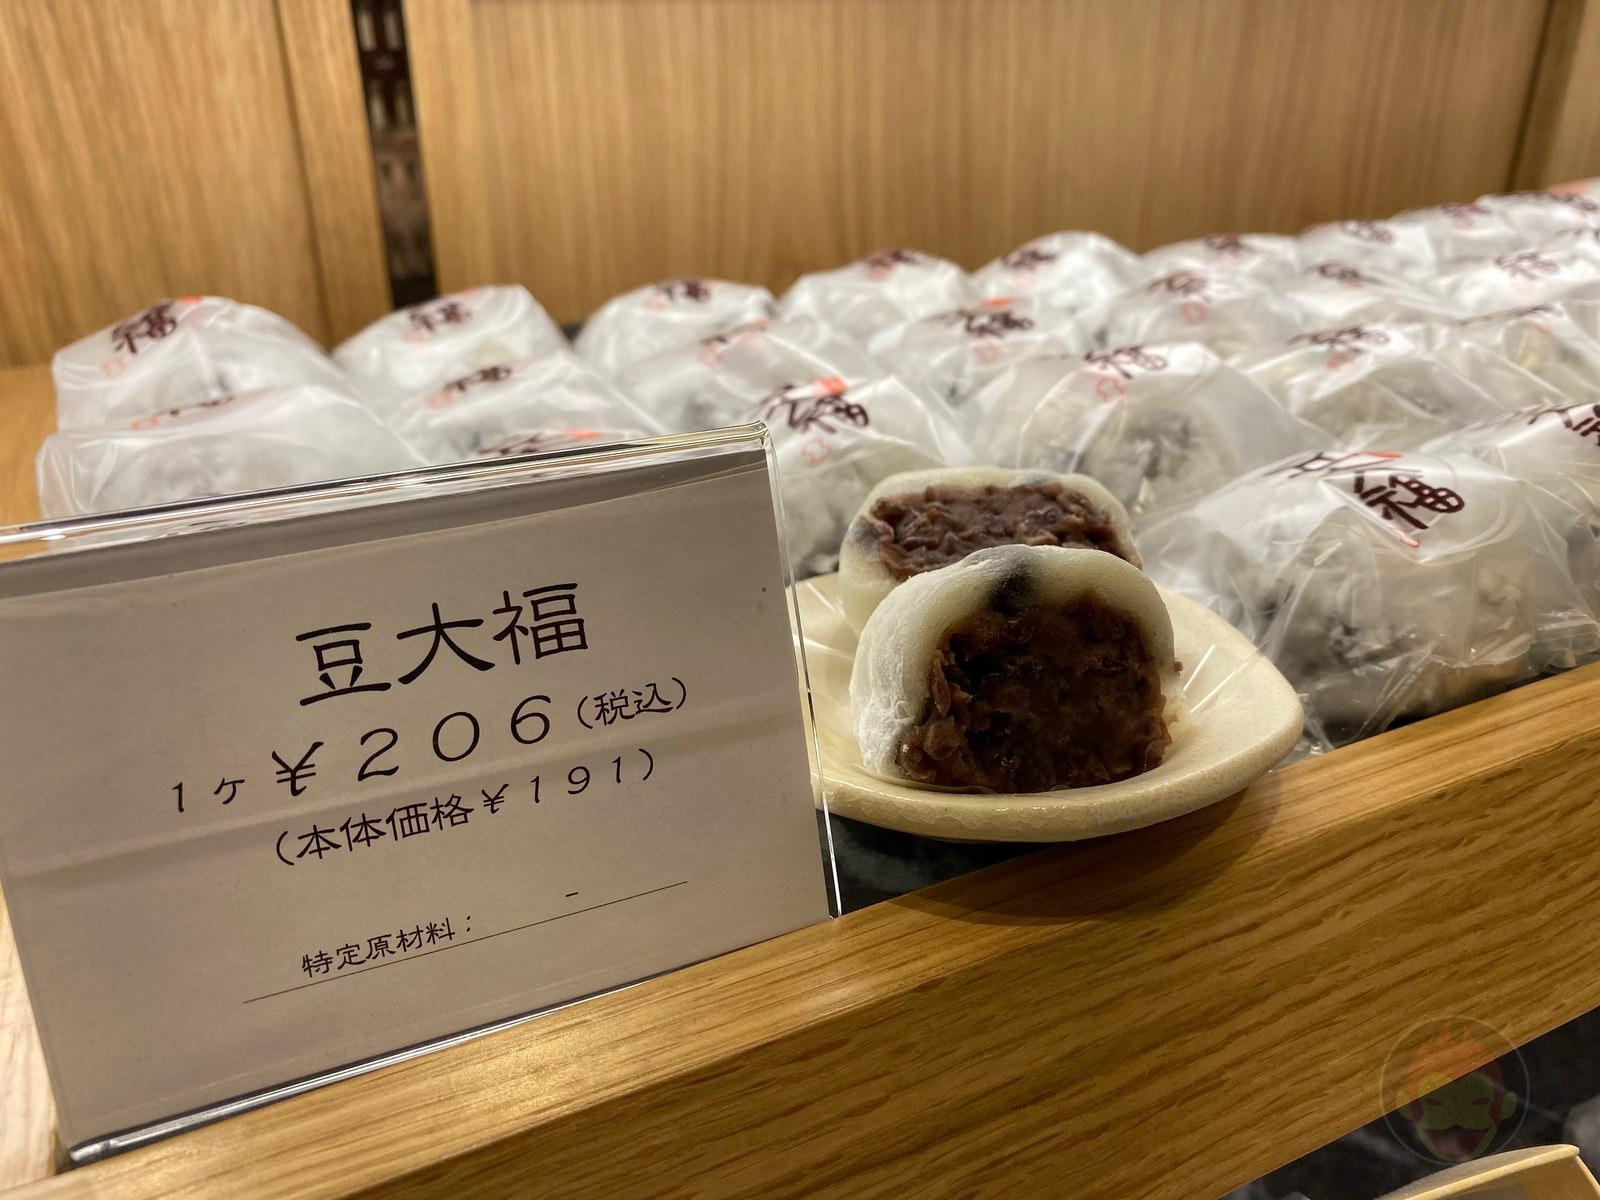 Shibuya-Scramble-Square-Food-I-Ate-36.jpeg